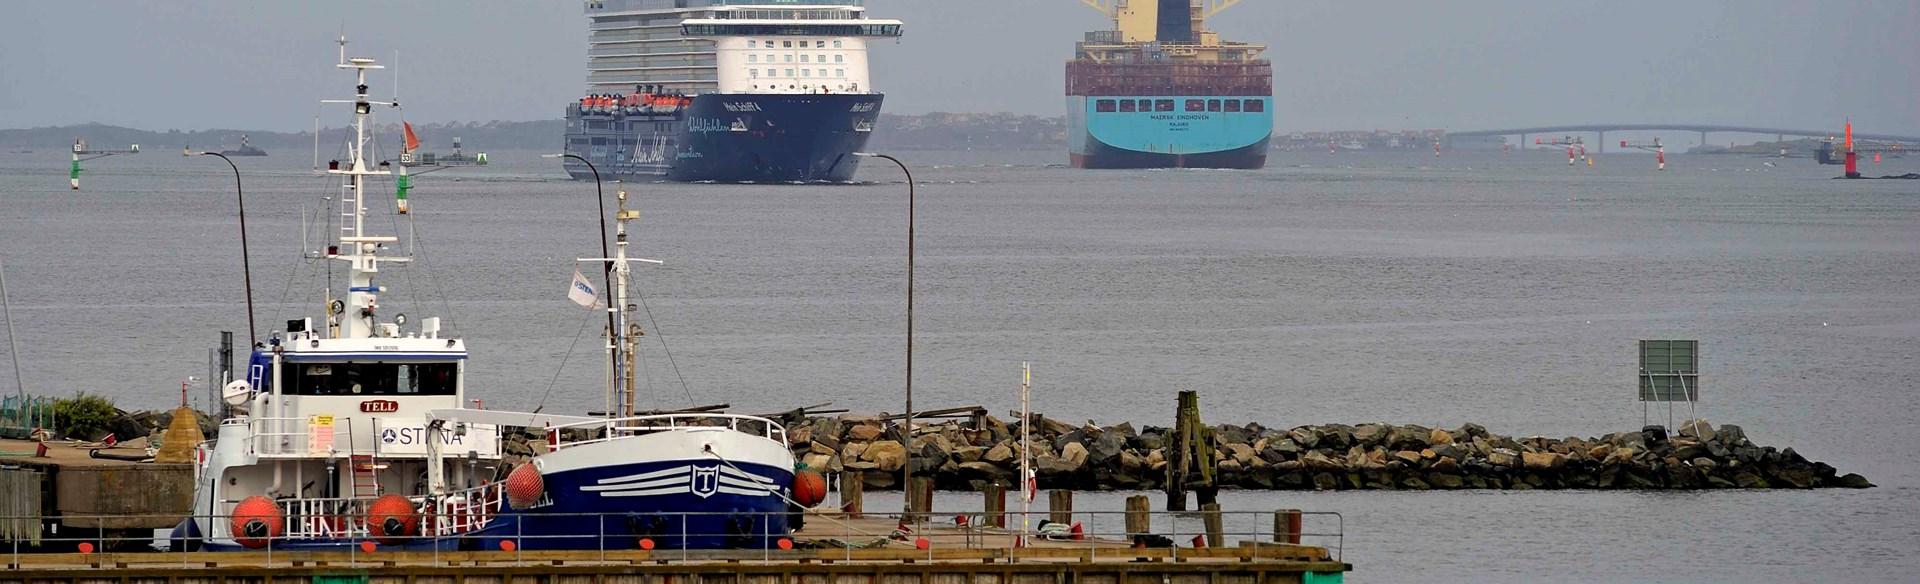 Maritime Bilder maritime services